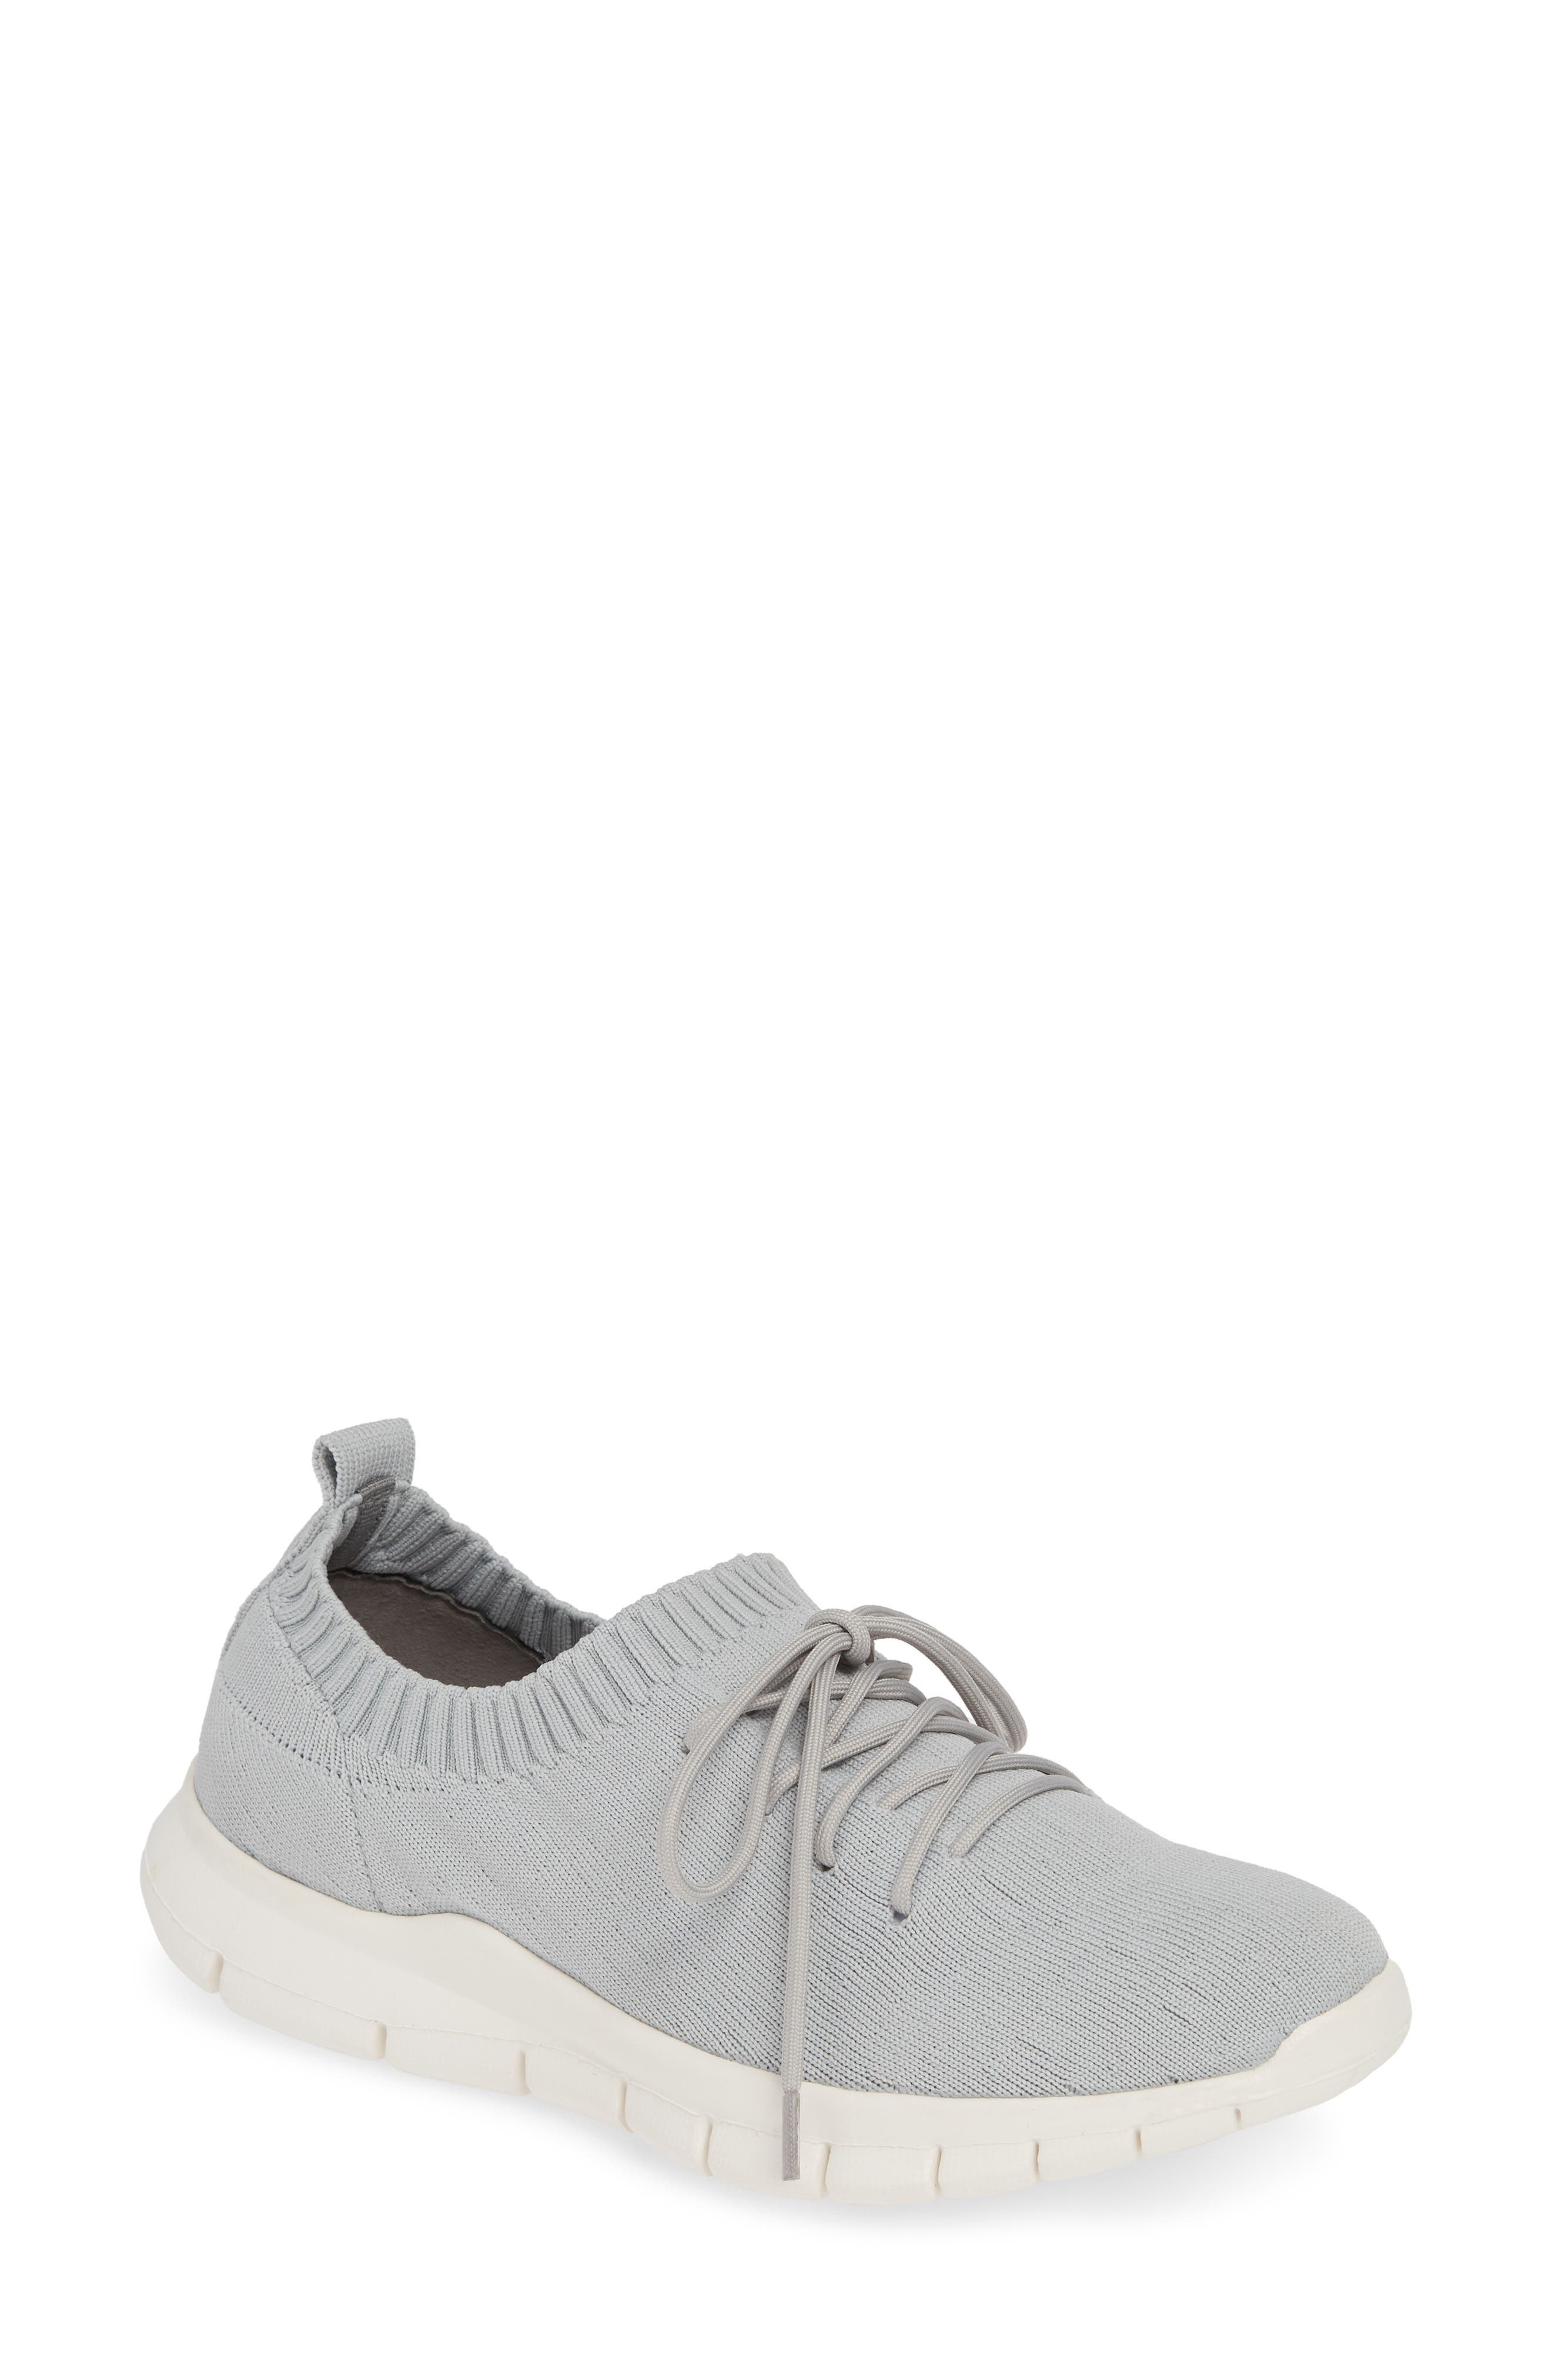 Bernie Mev Plush Sneaker, Grey